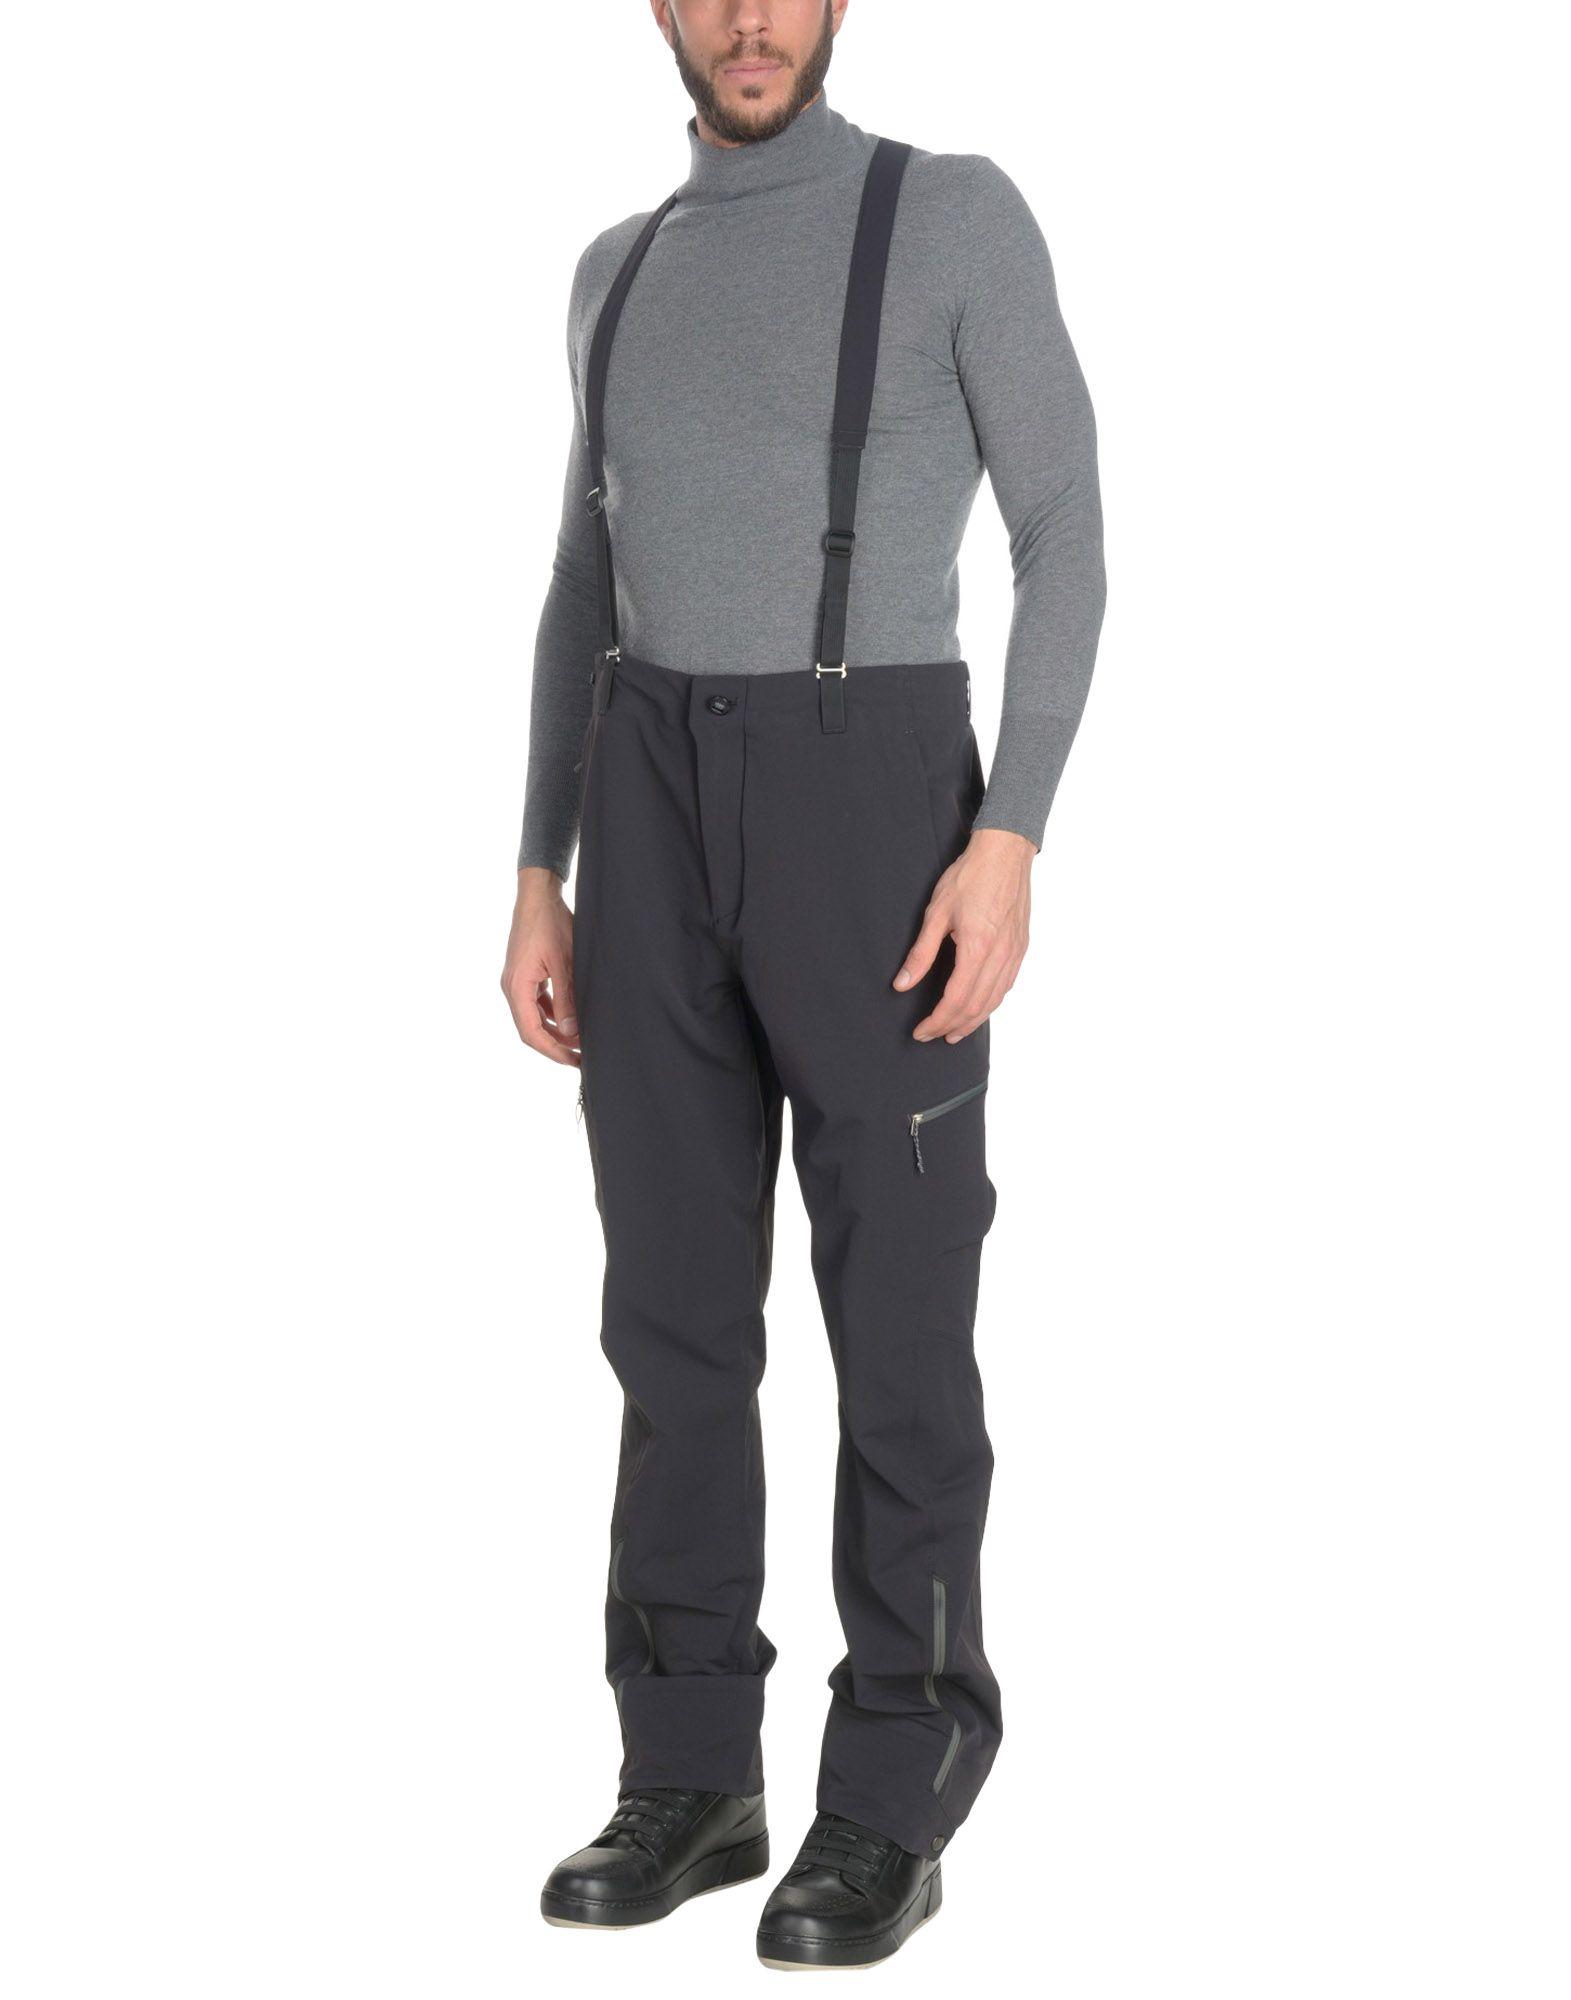 Pantaloni Sci Patagonia Uomo - Acquista online su